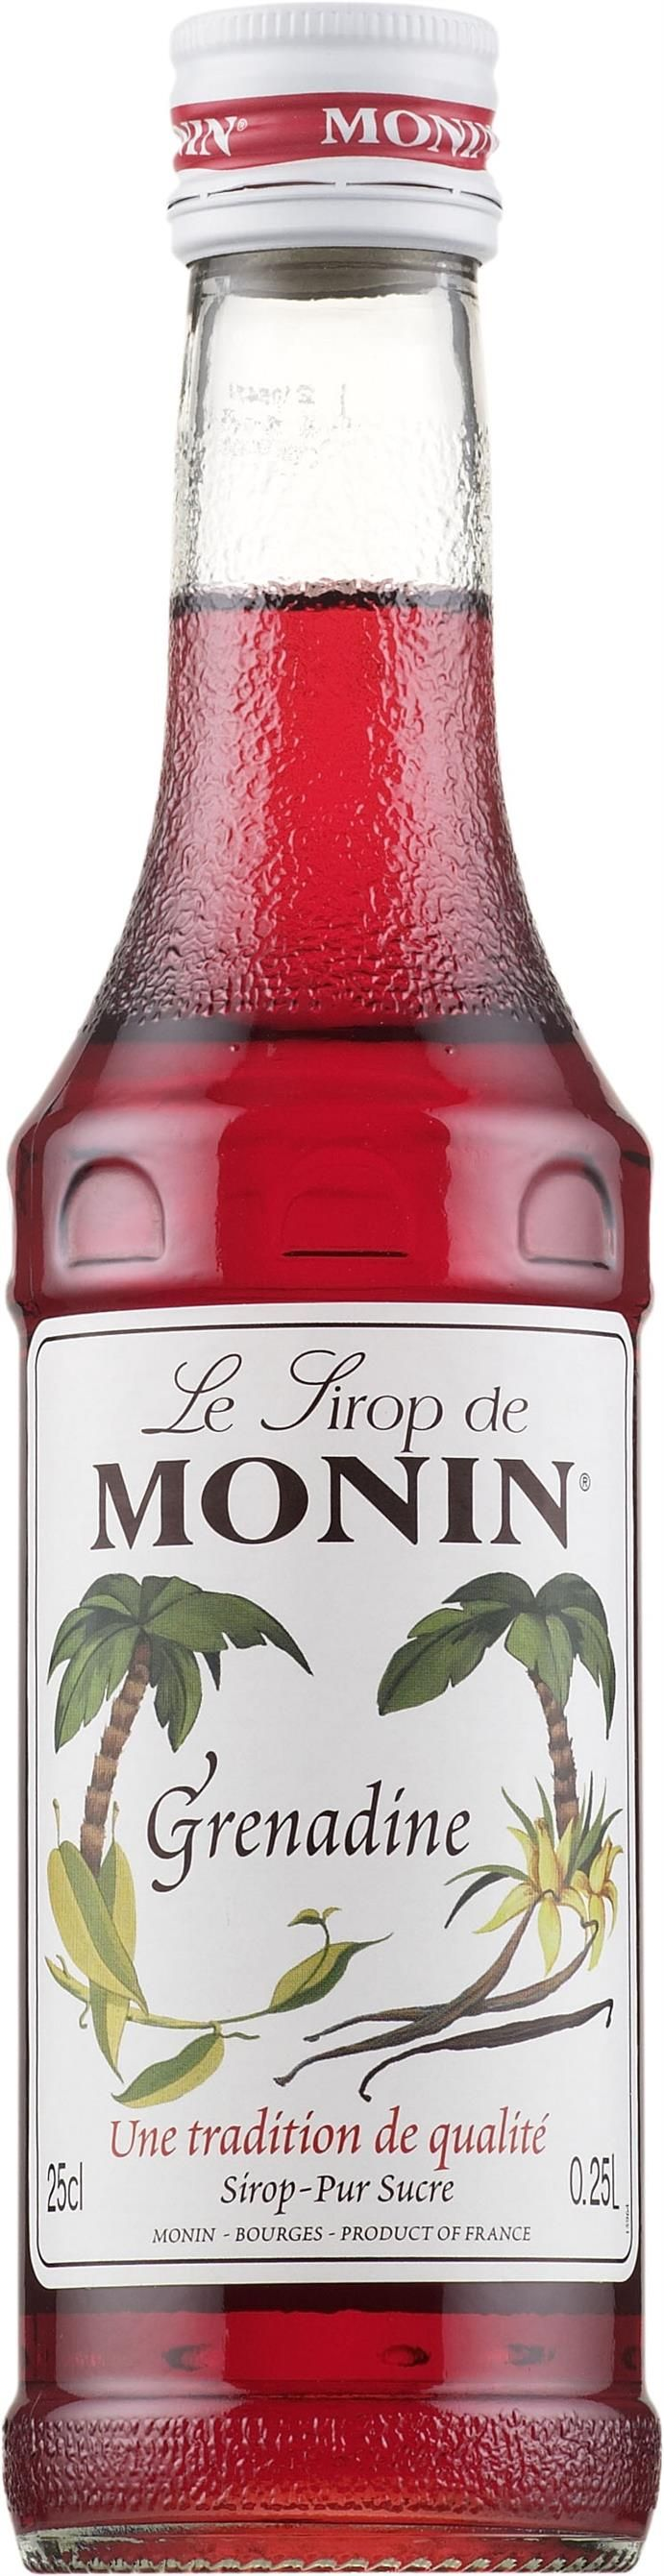 Le Sirop de Monin Grenadine - Alkoholittomat | Alko